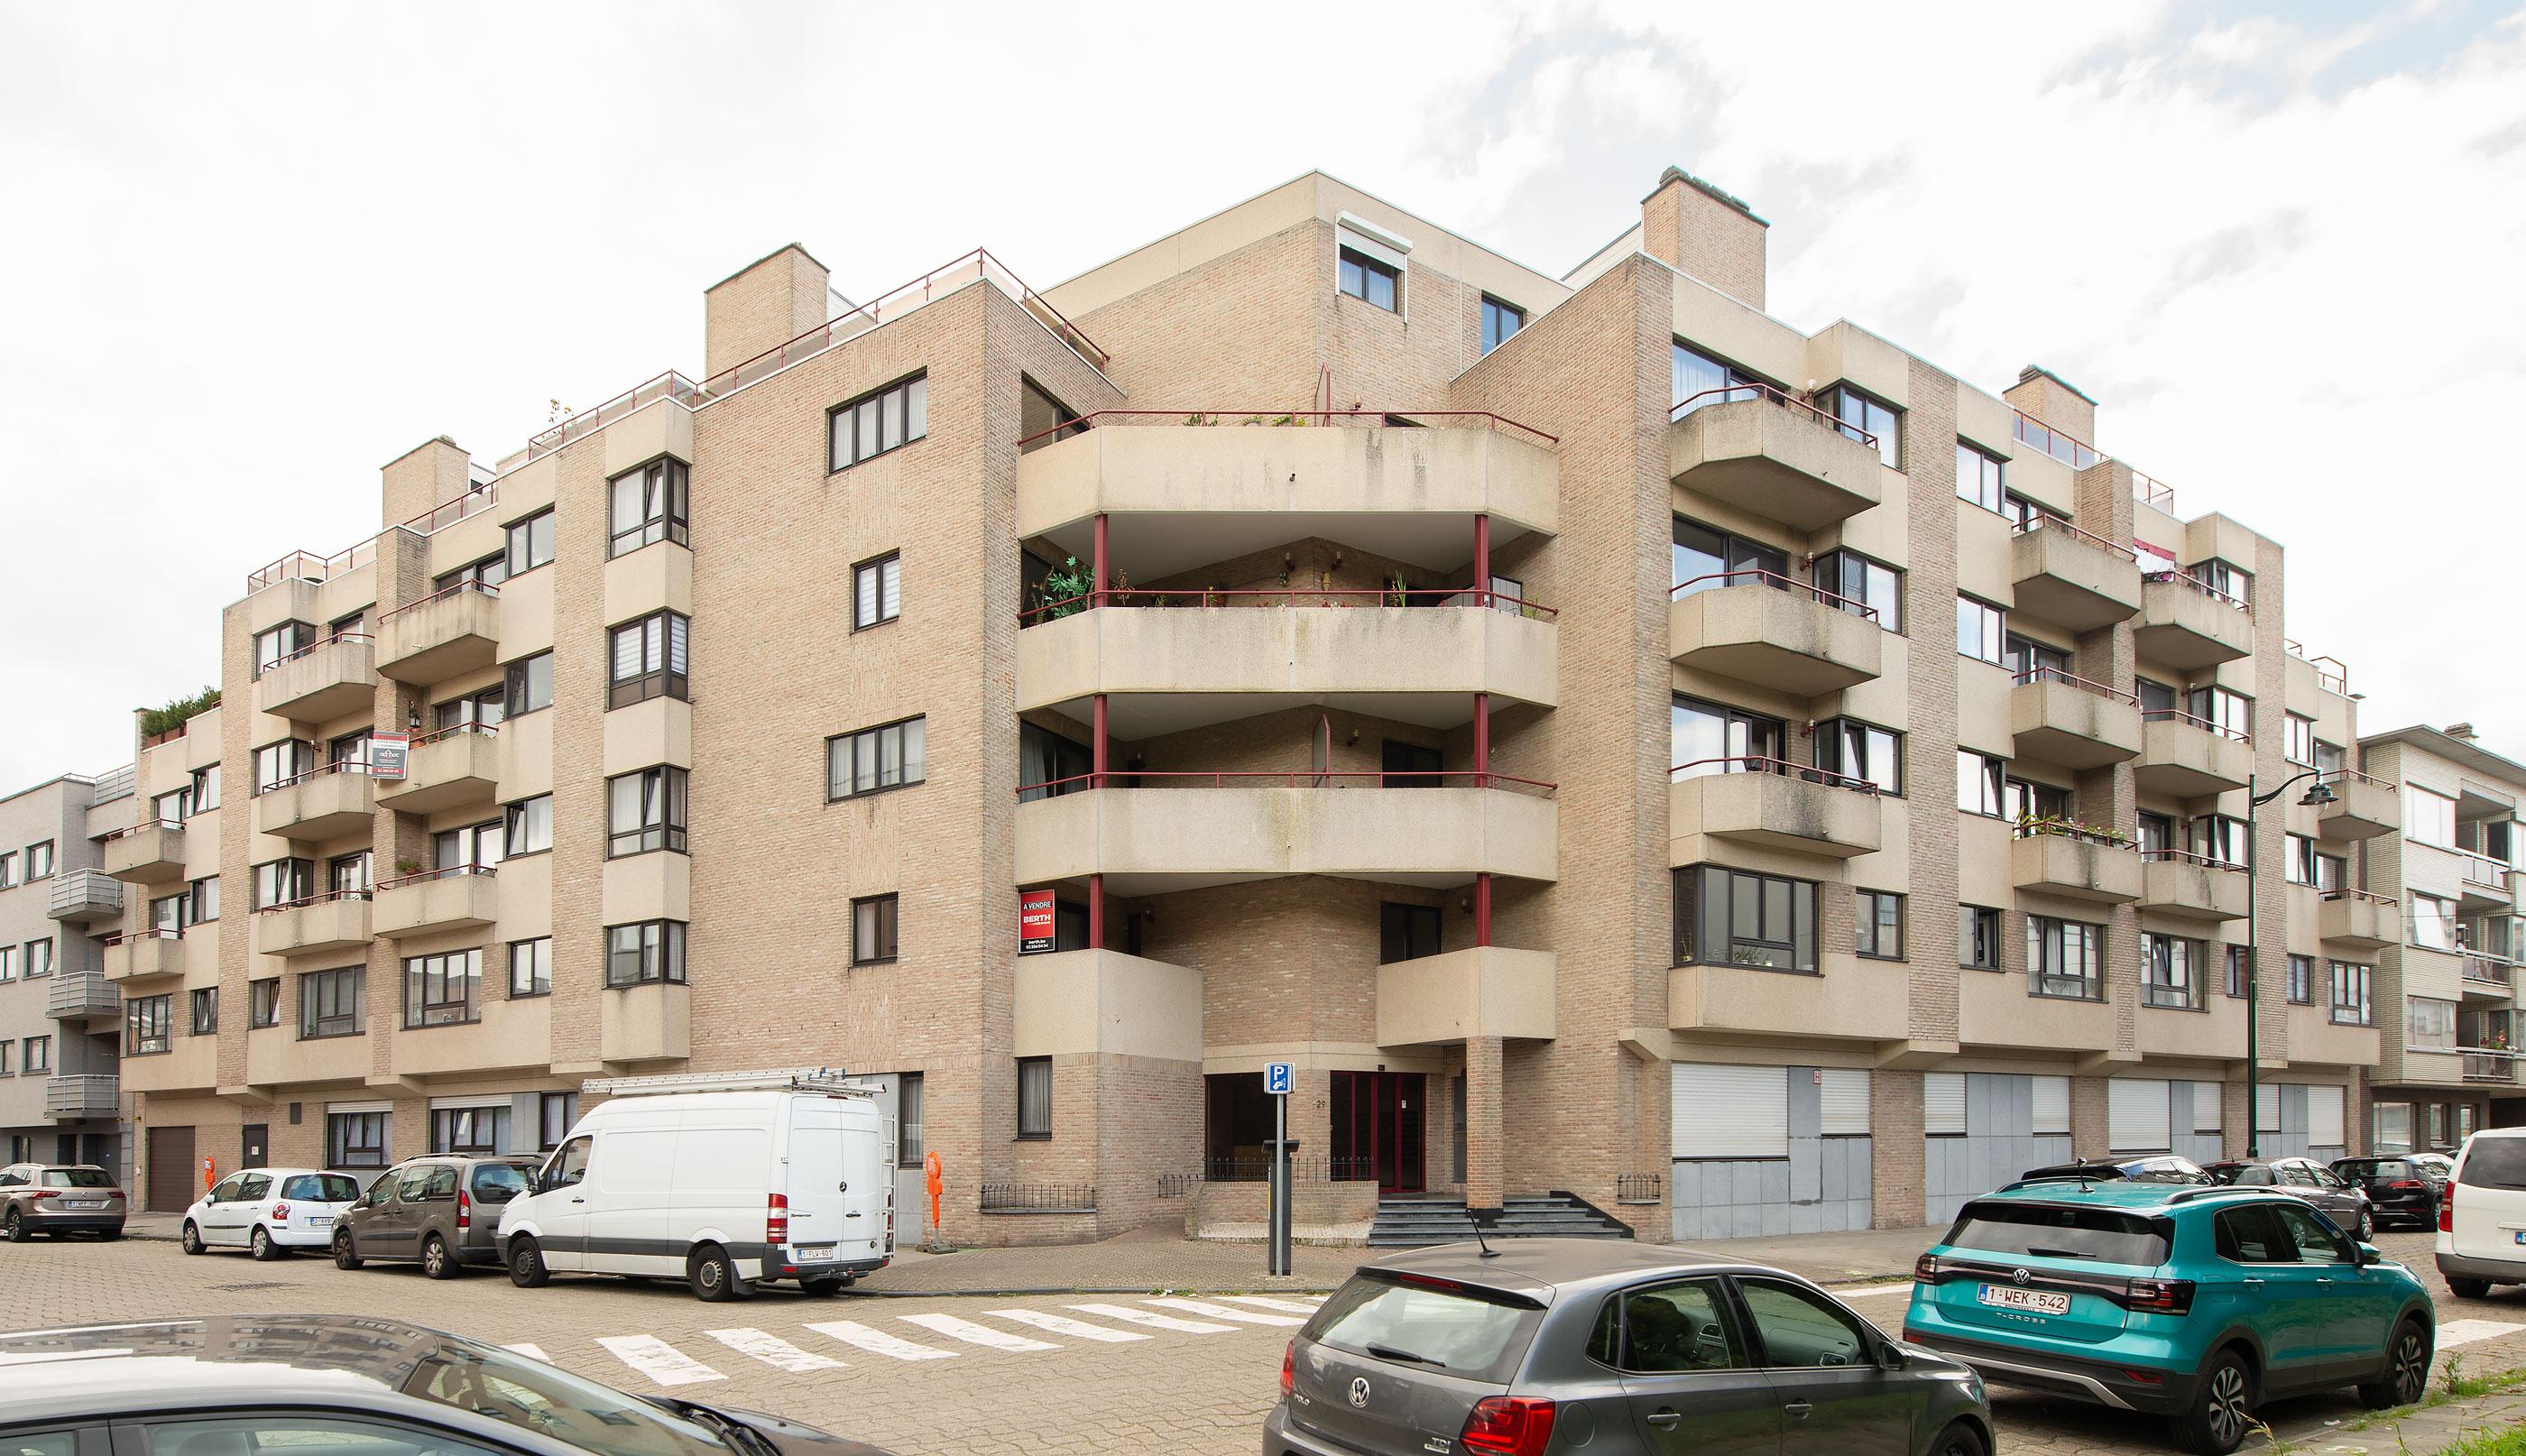 Schoonslaapsterstraat 29, 1080 Sint-Jans-Molenbeek